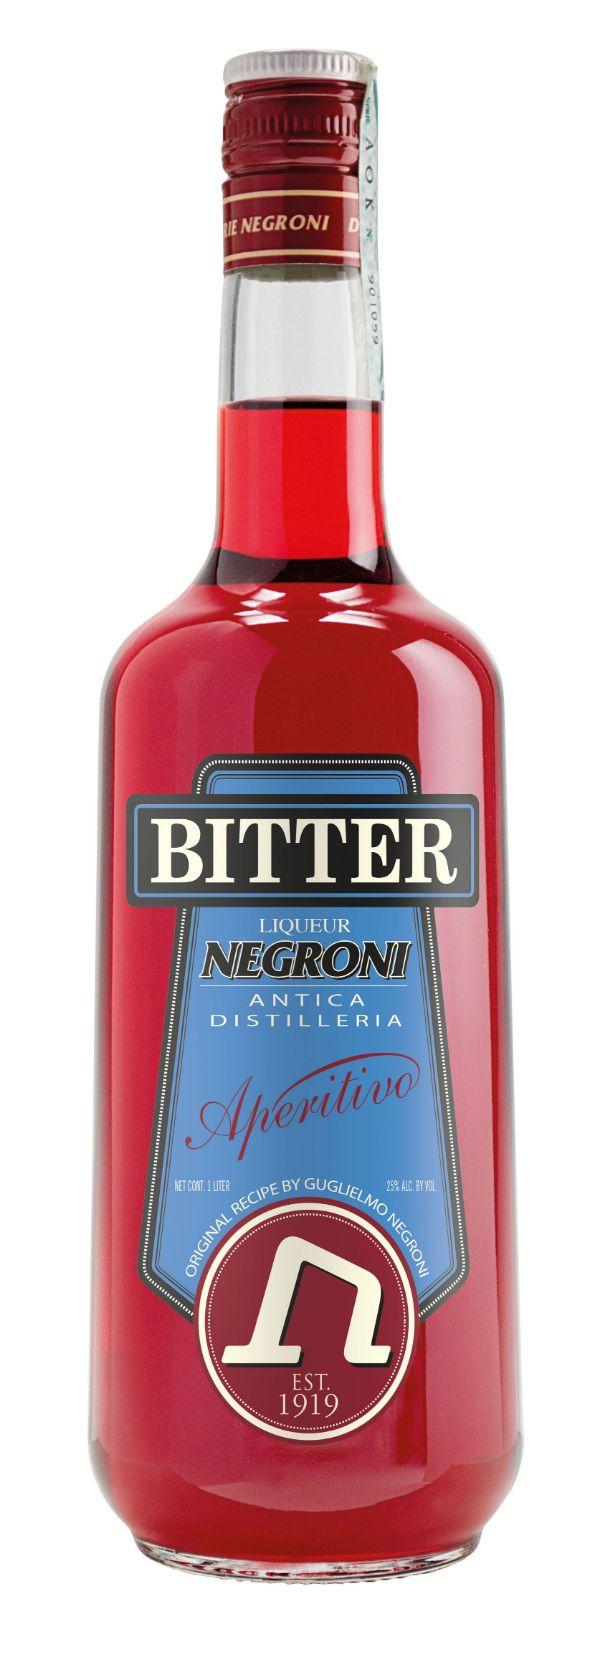 Negroni Bitter Aperitivo Liqueur